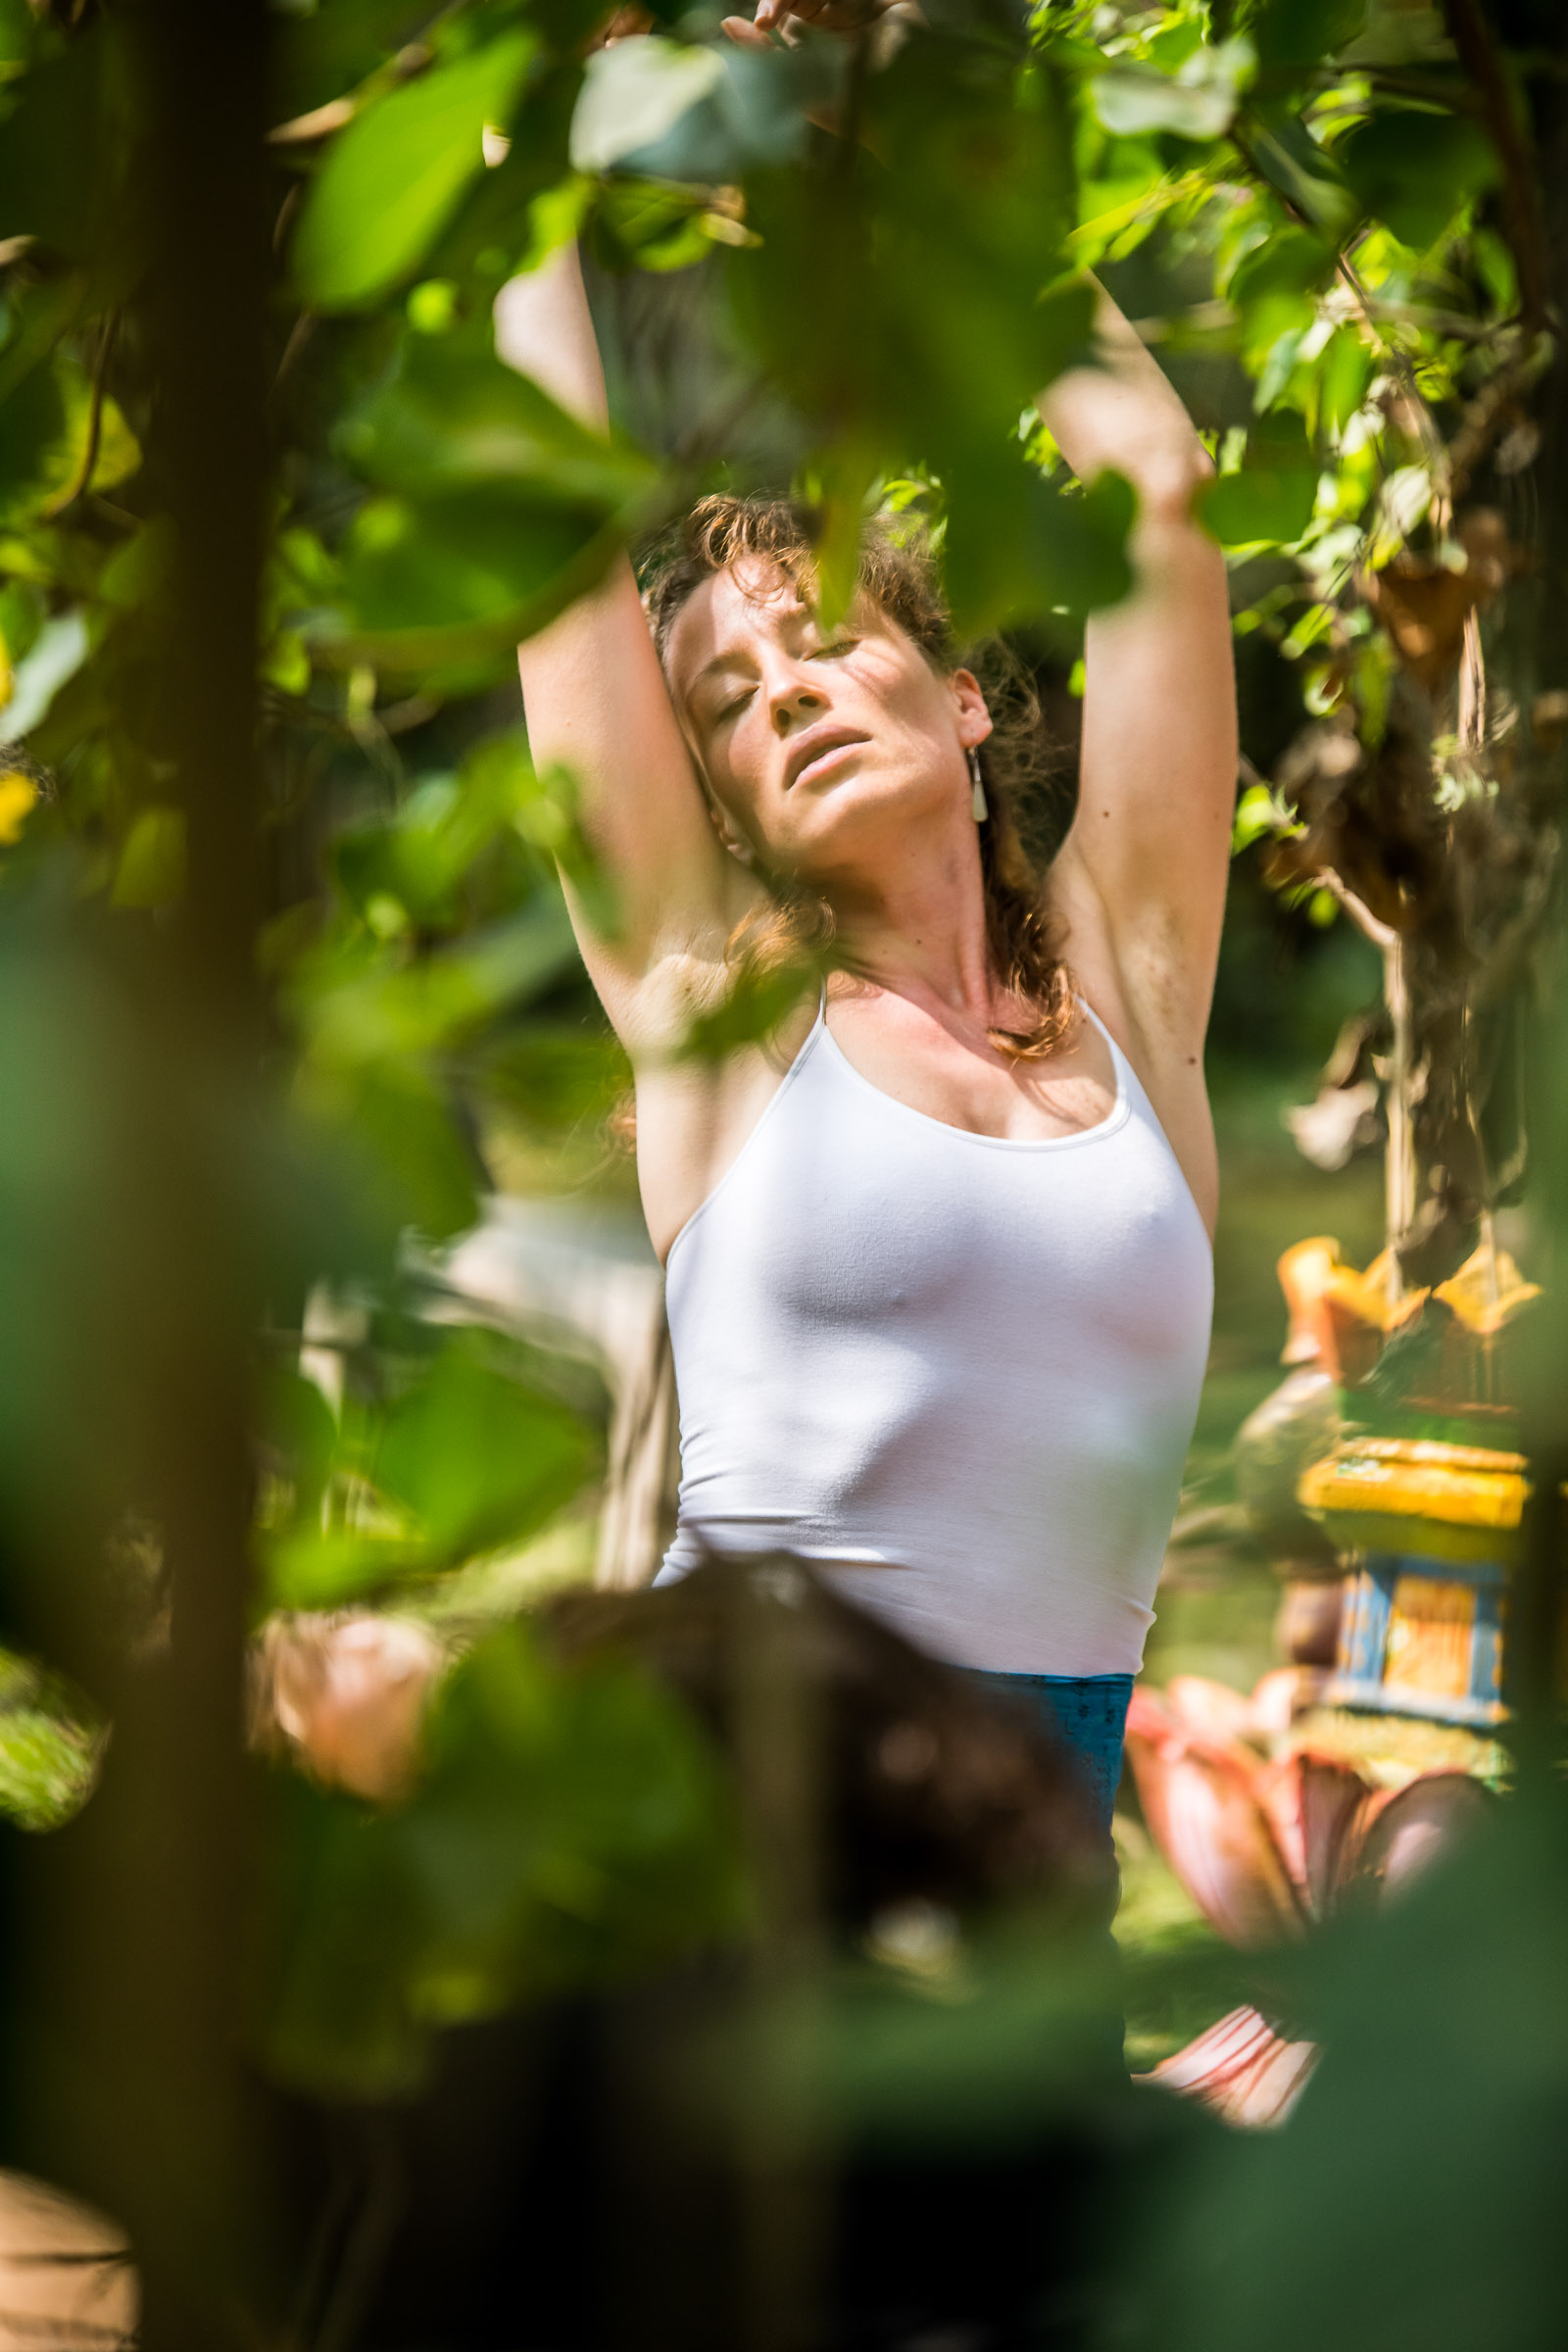 Holistic Dance, Yoga, Meditation Retreat Photographer - Magdalena Smolarska Photography